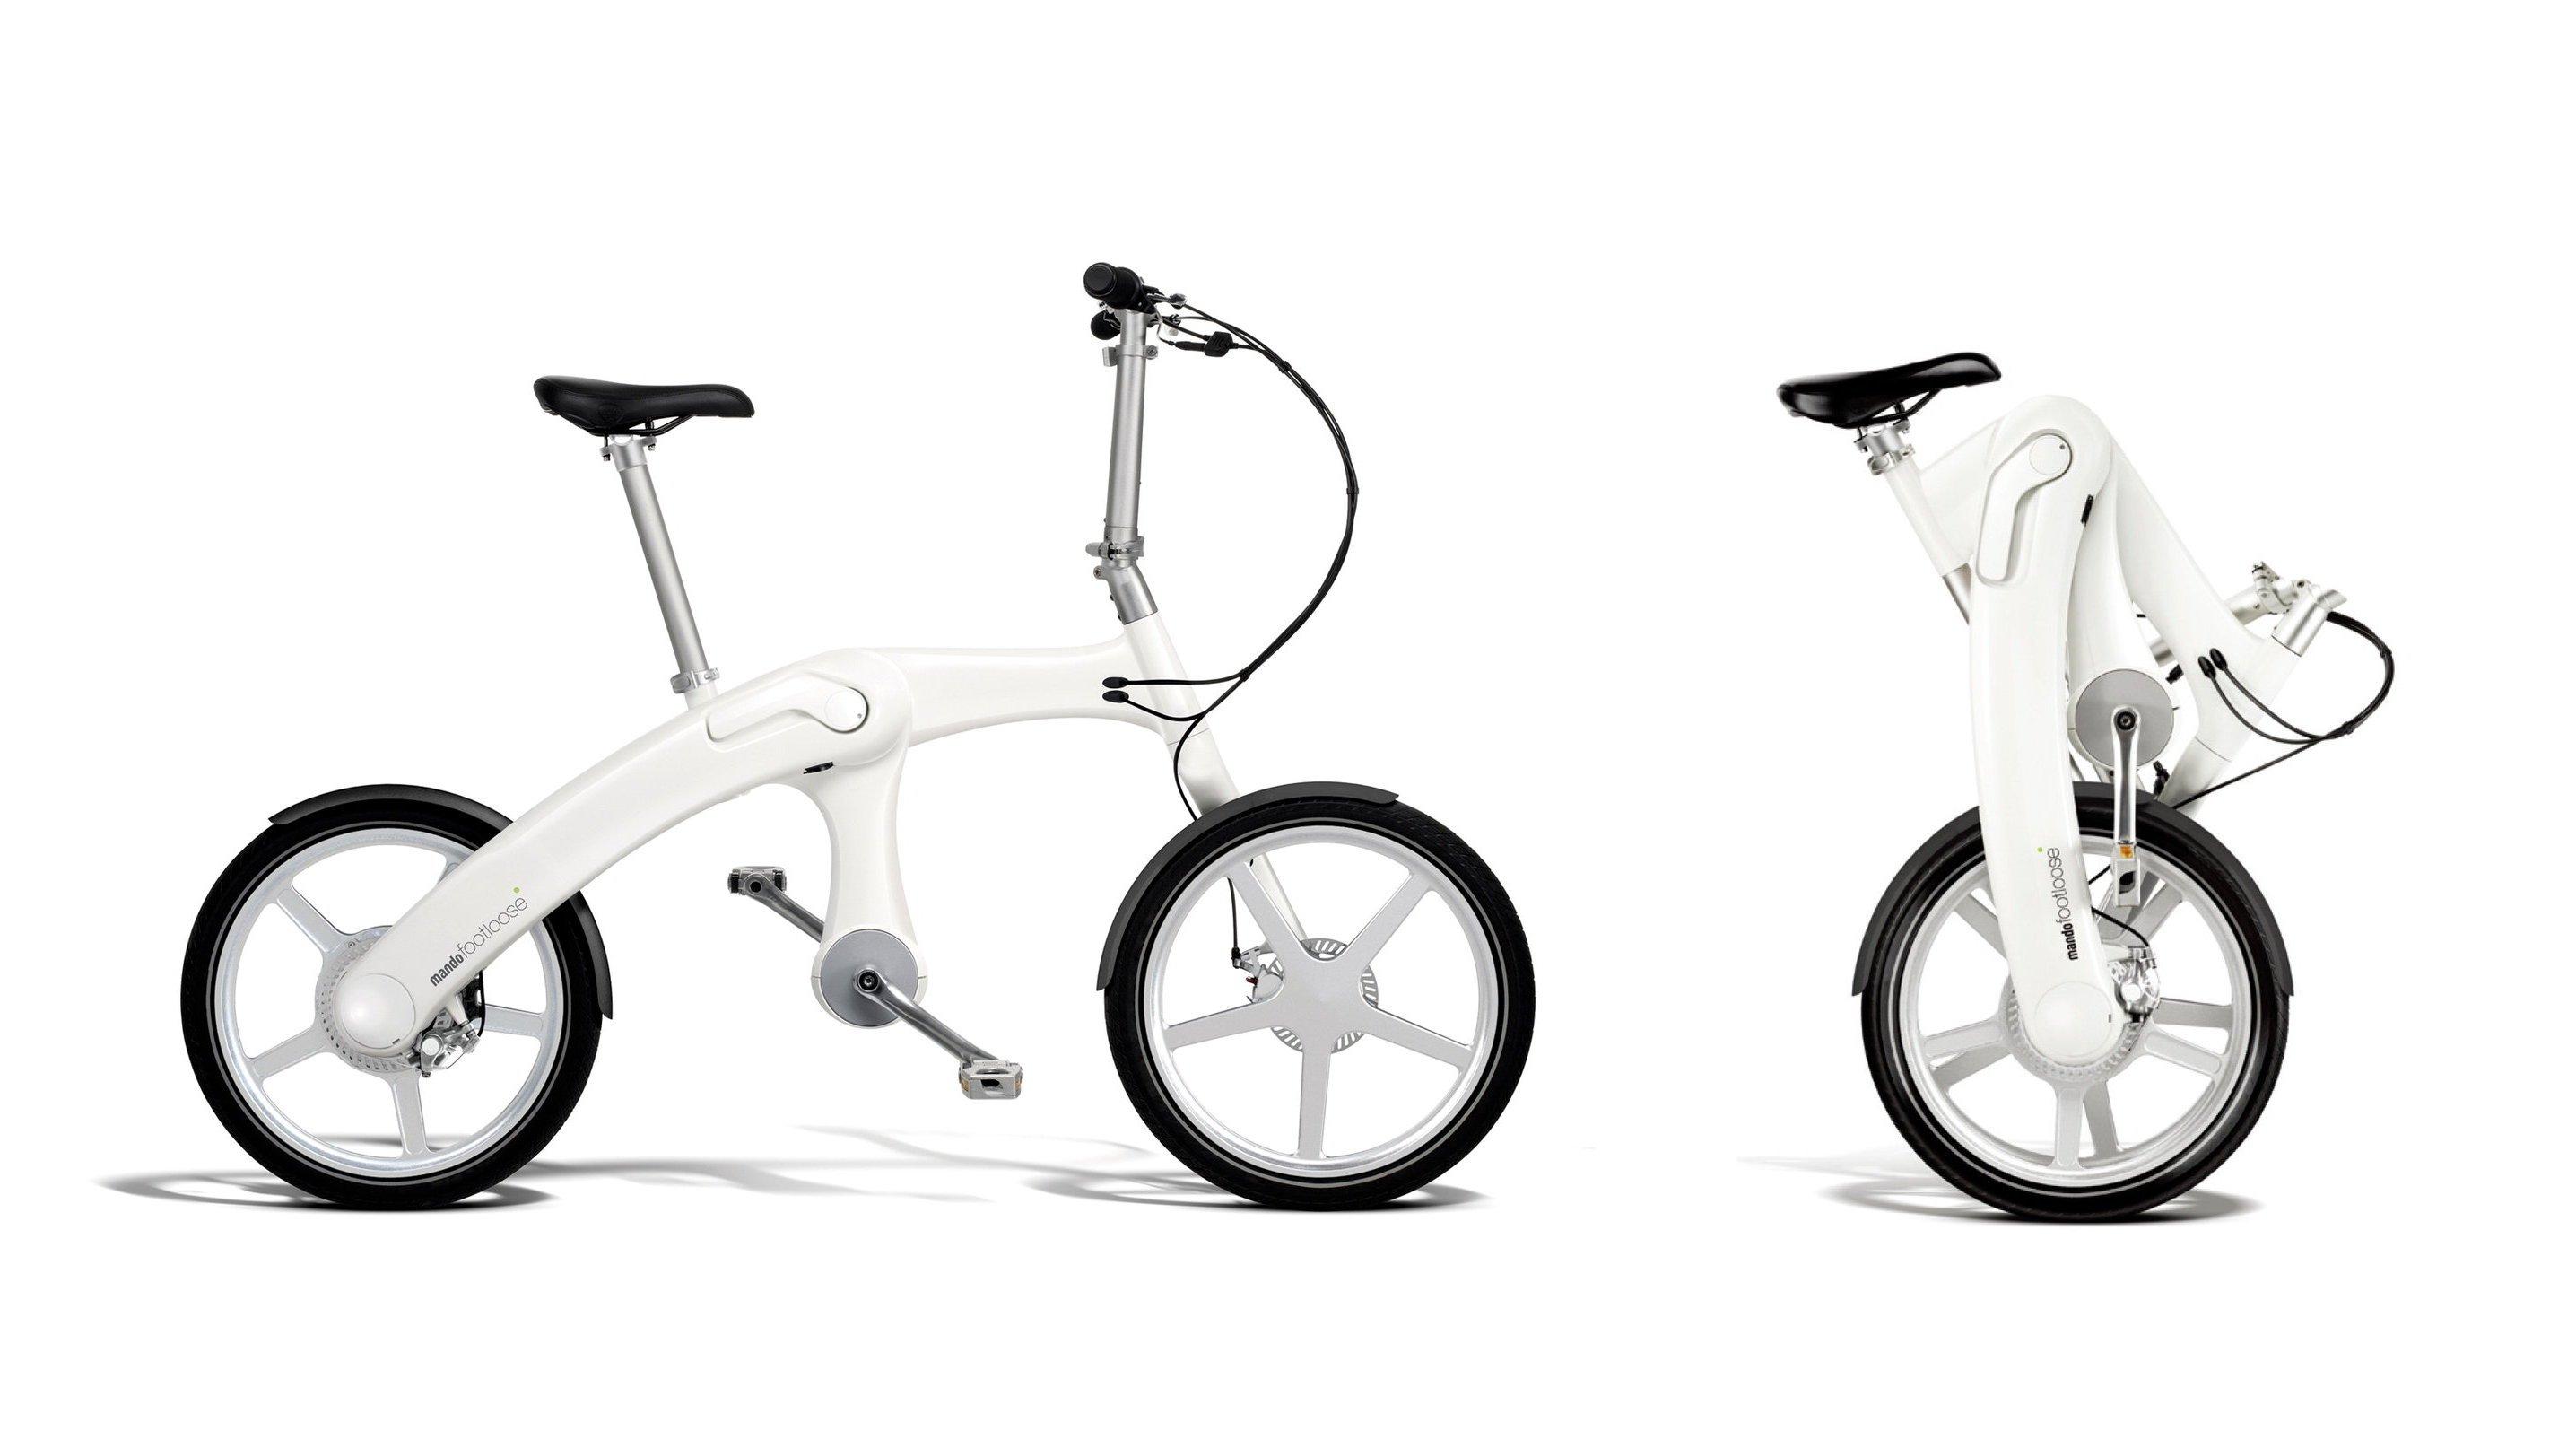 Mando Footloose - das faltbare und kettenlose E-Bike.